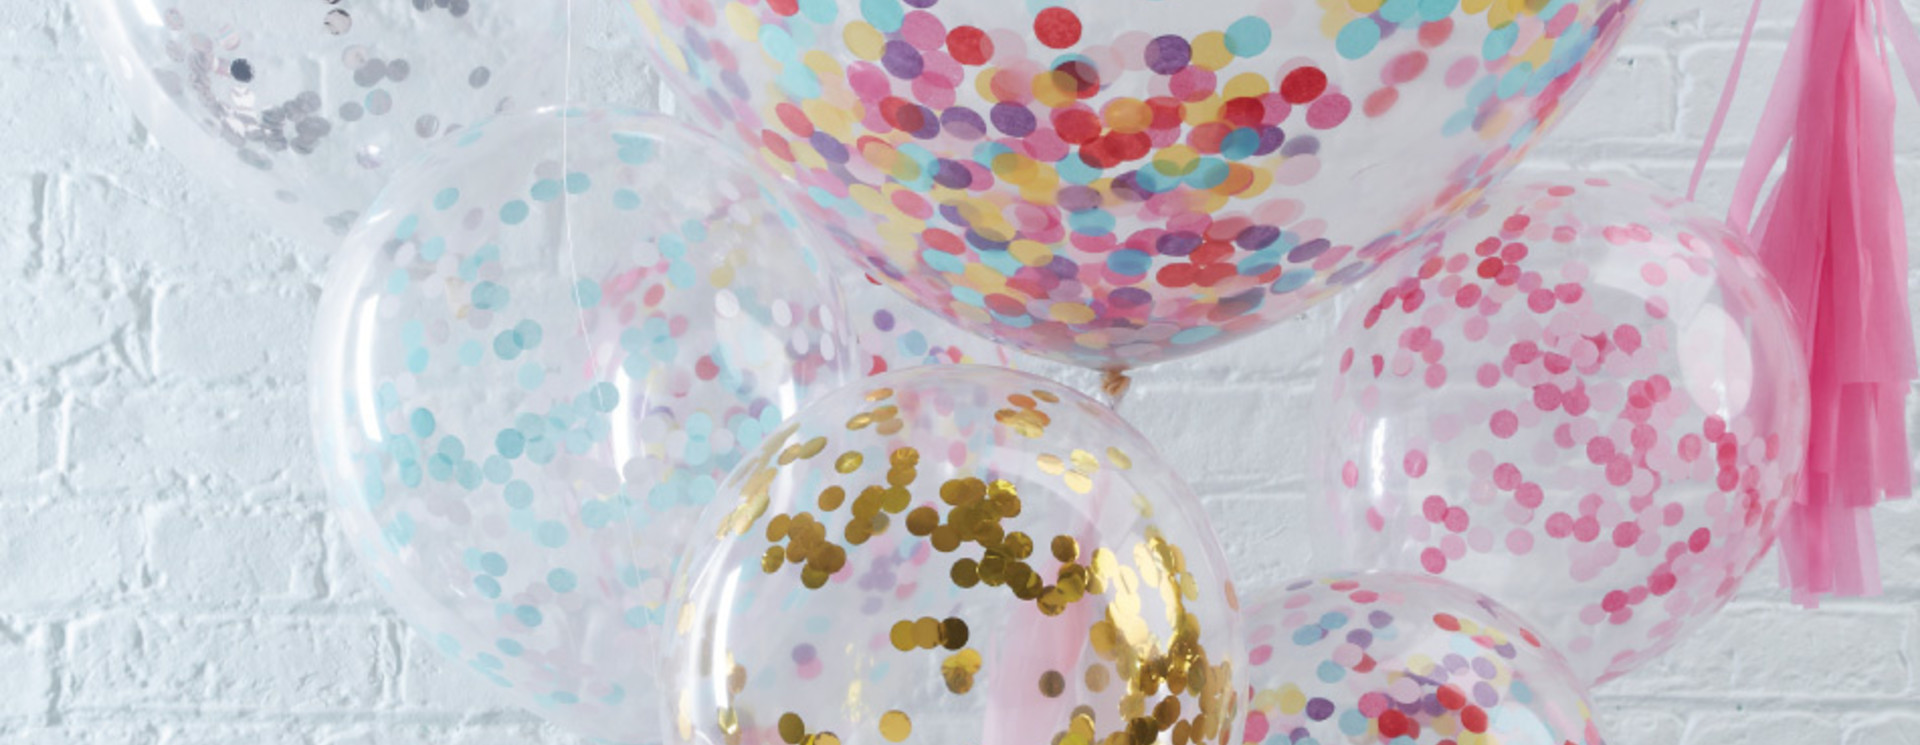 Confetti ballonnen